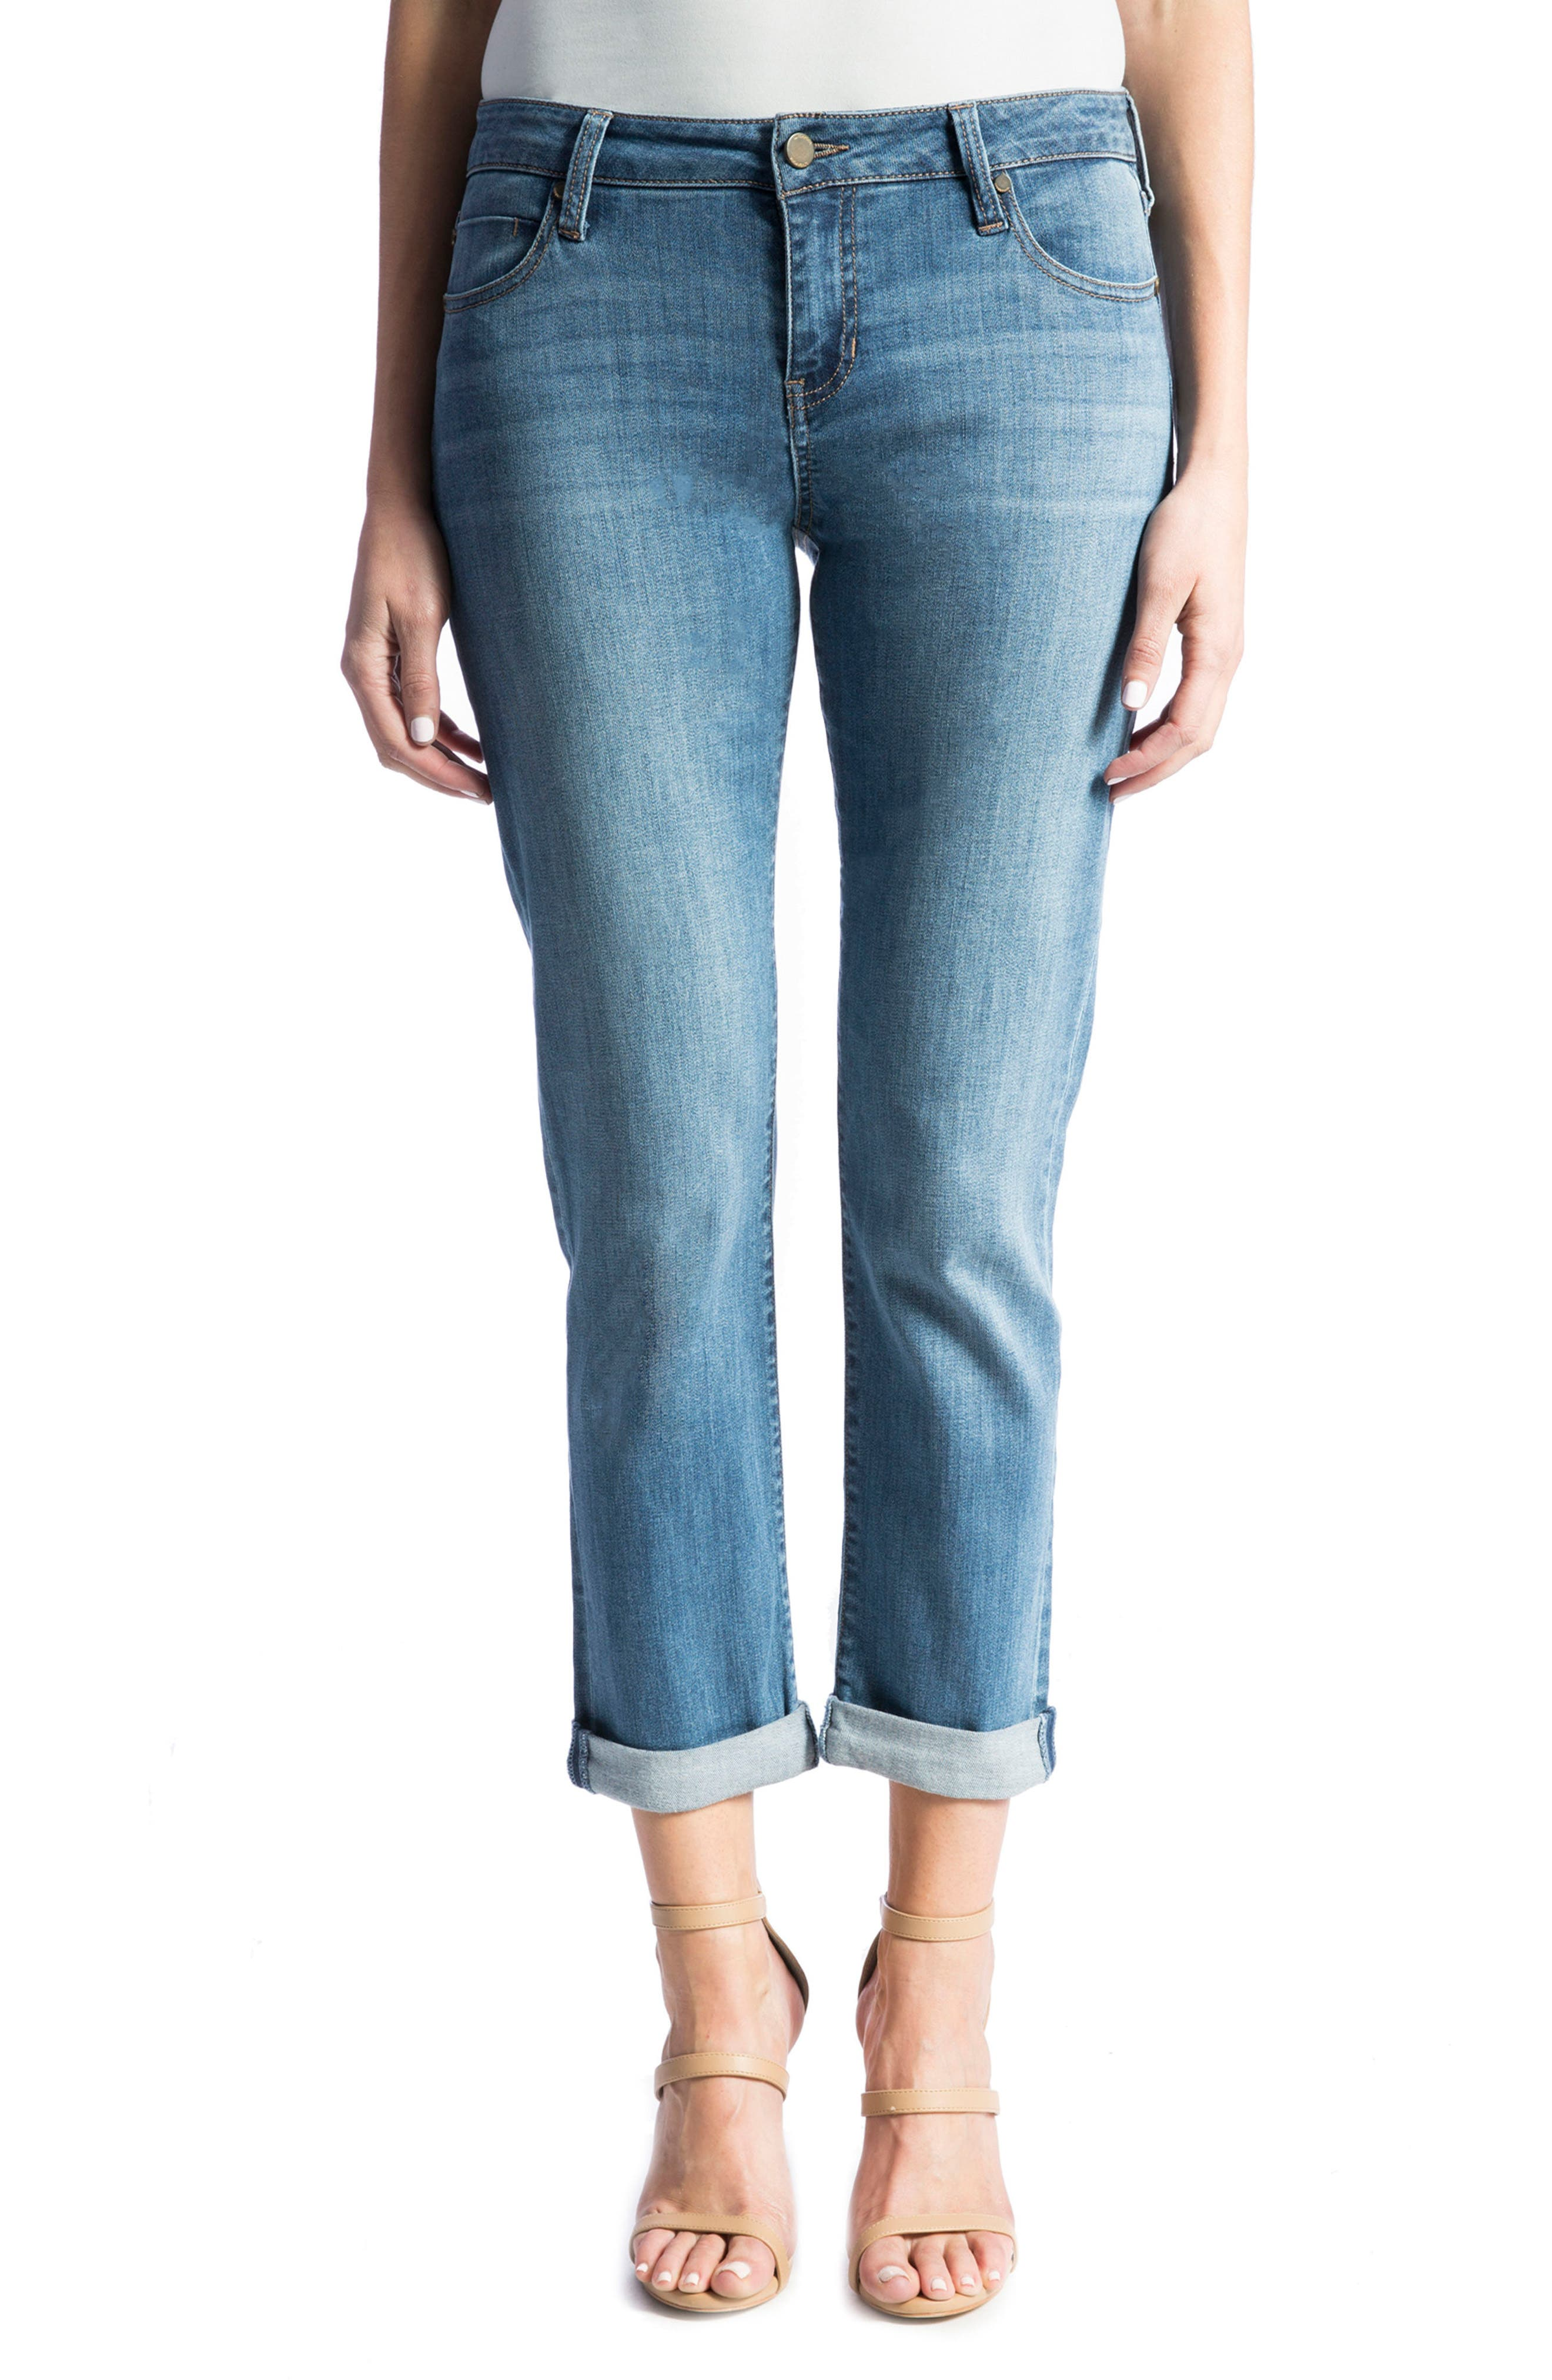 Main Image - Liverpool Jeans Company 'Peyton' Slim Boyfriend Jeans (Vintage Me)